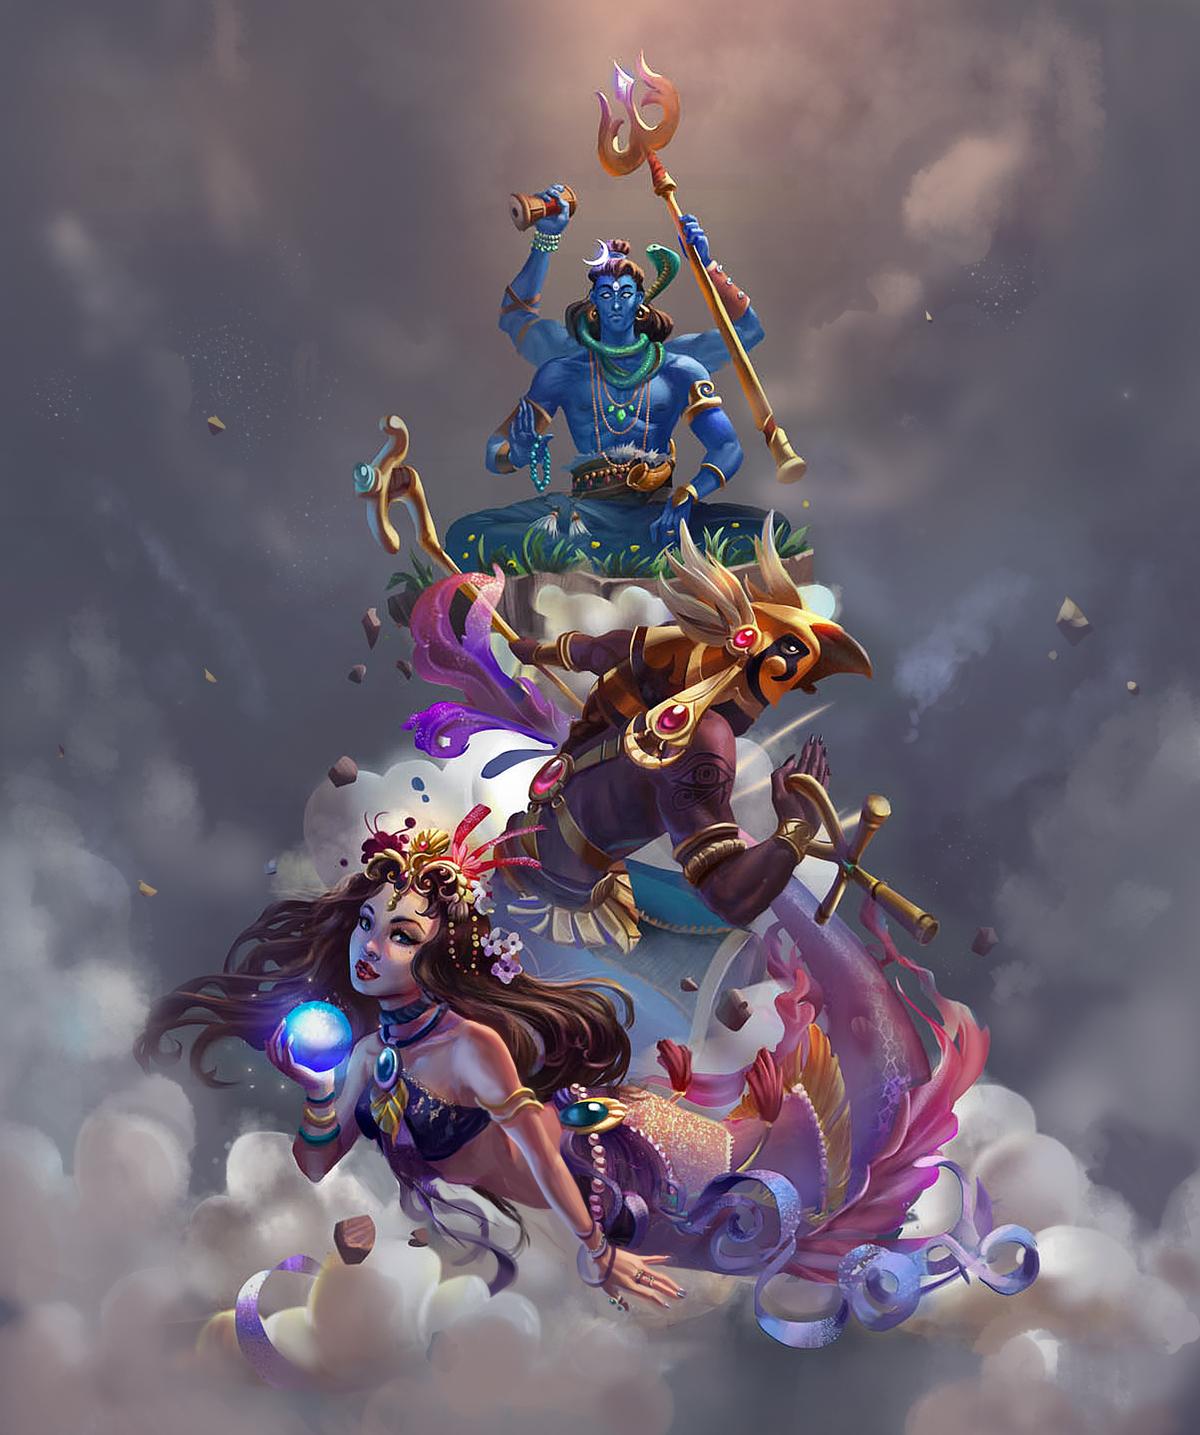 Myths and Legends - Promotion Art